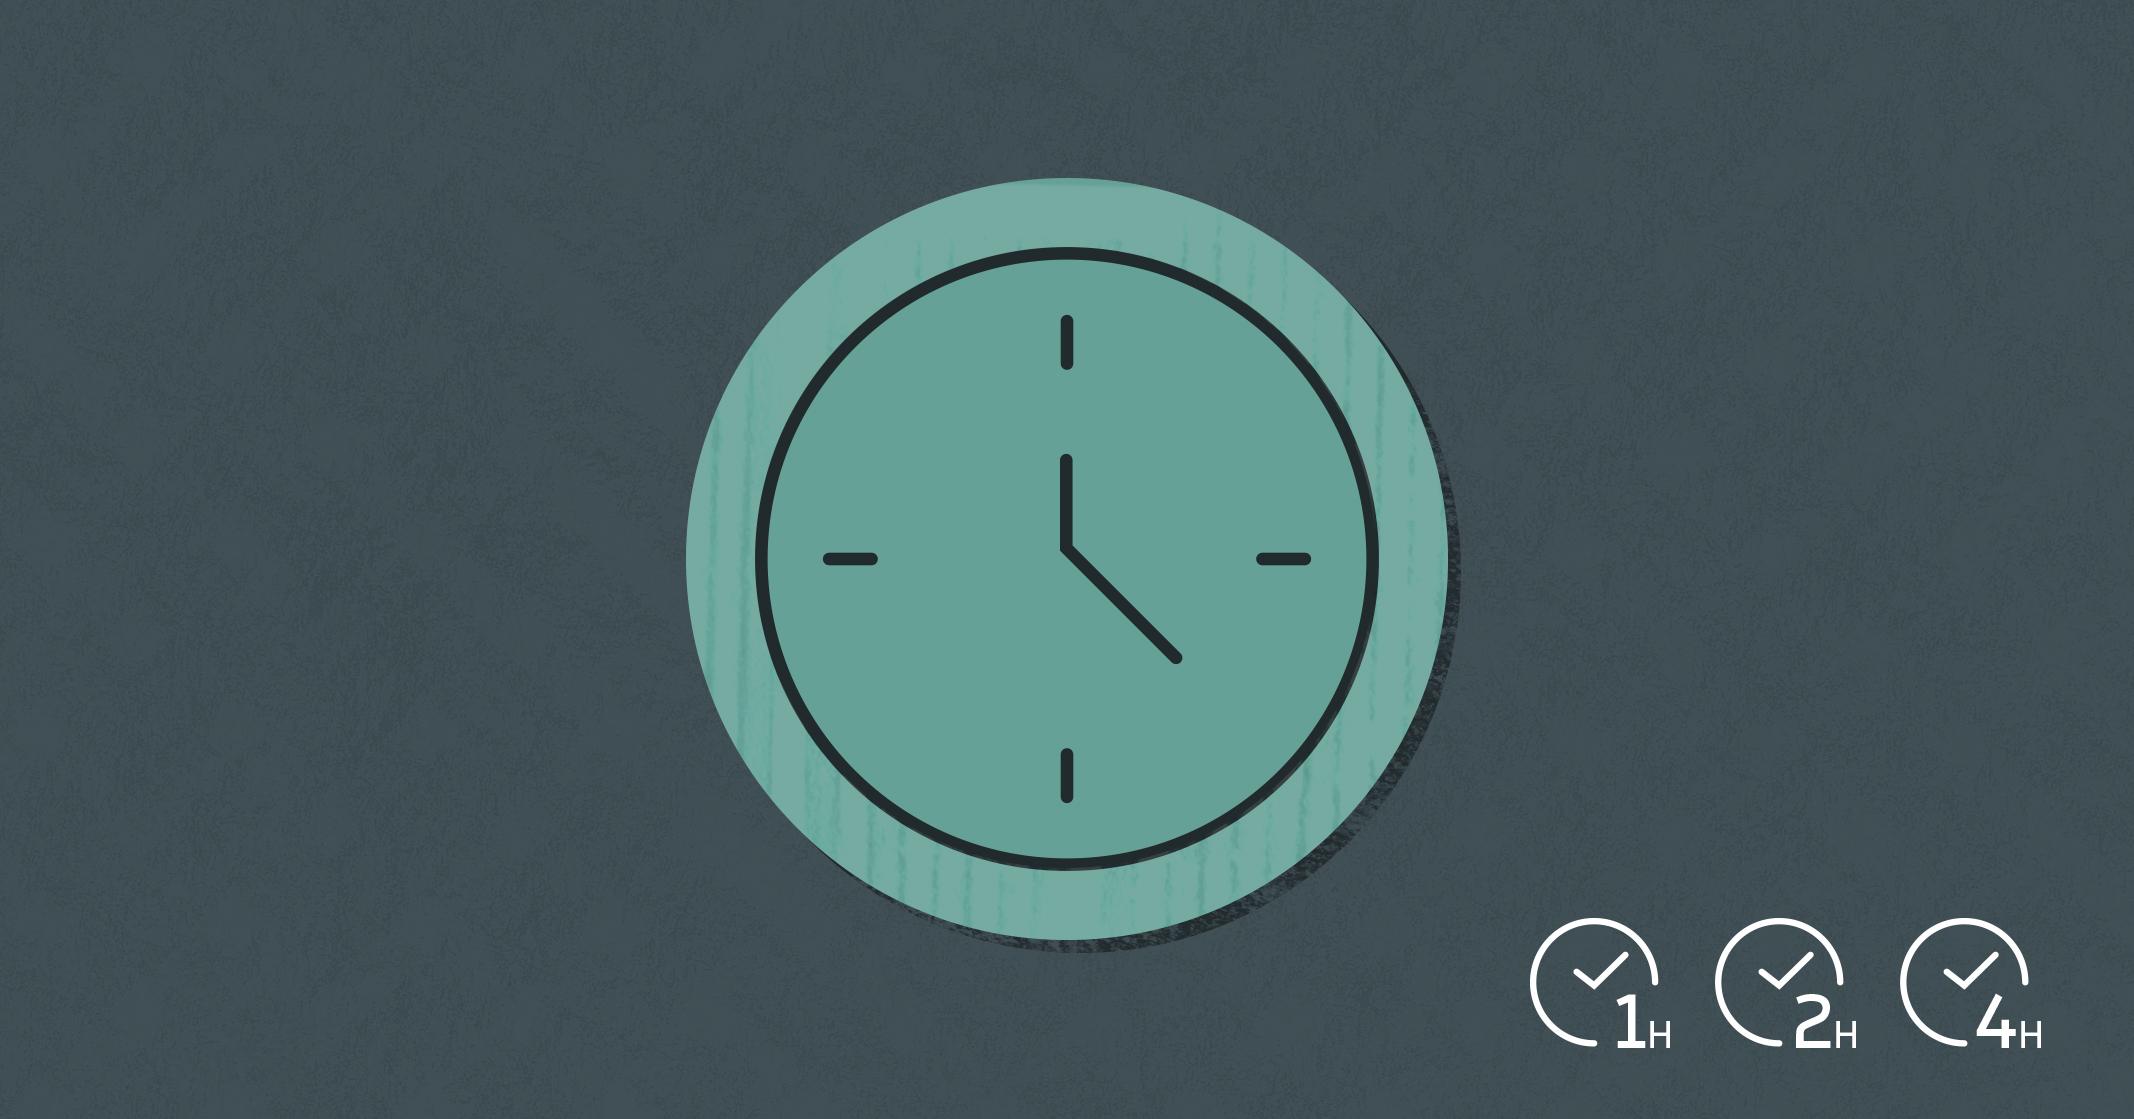 tempo_1_2_4 (1).jpg